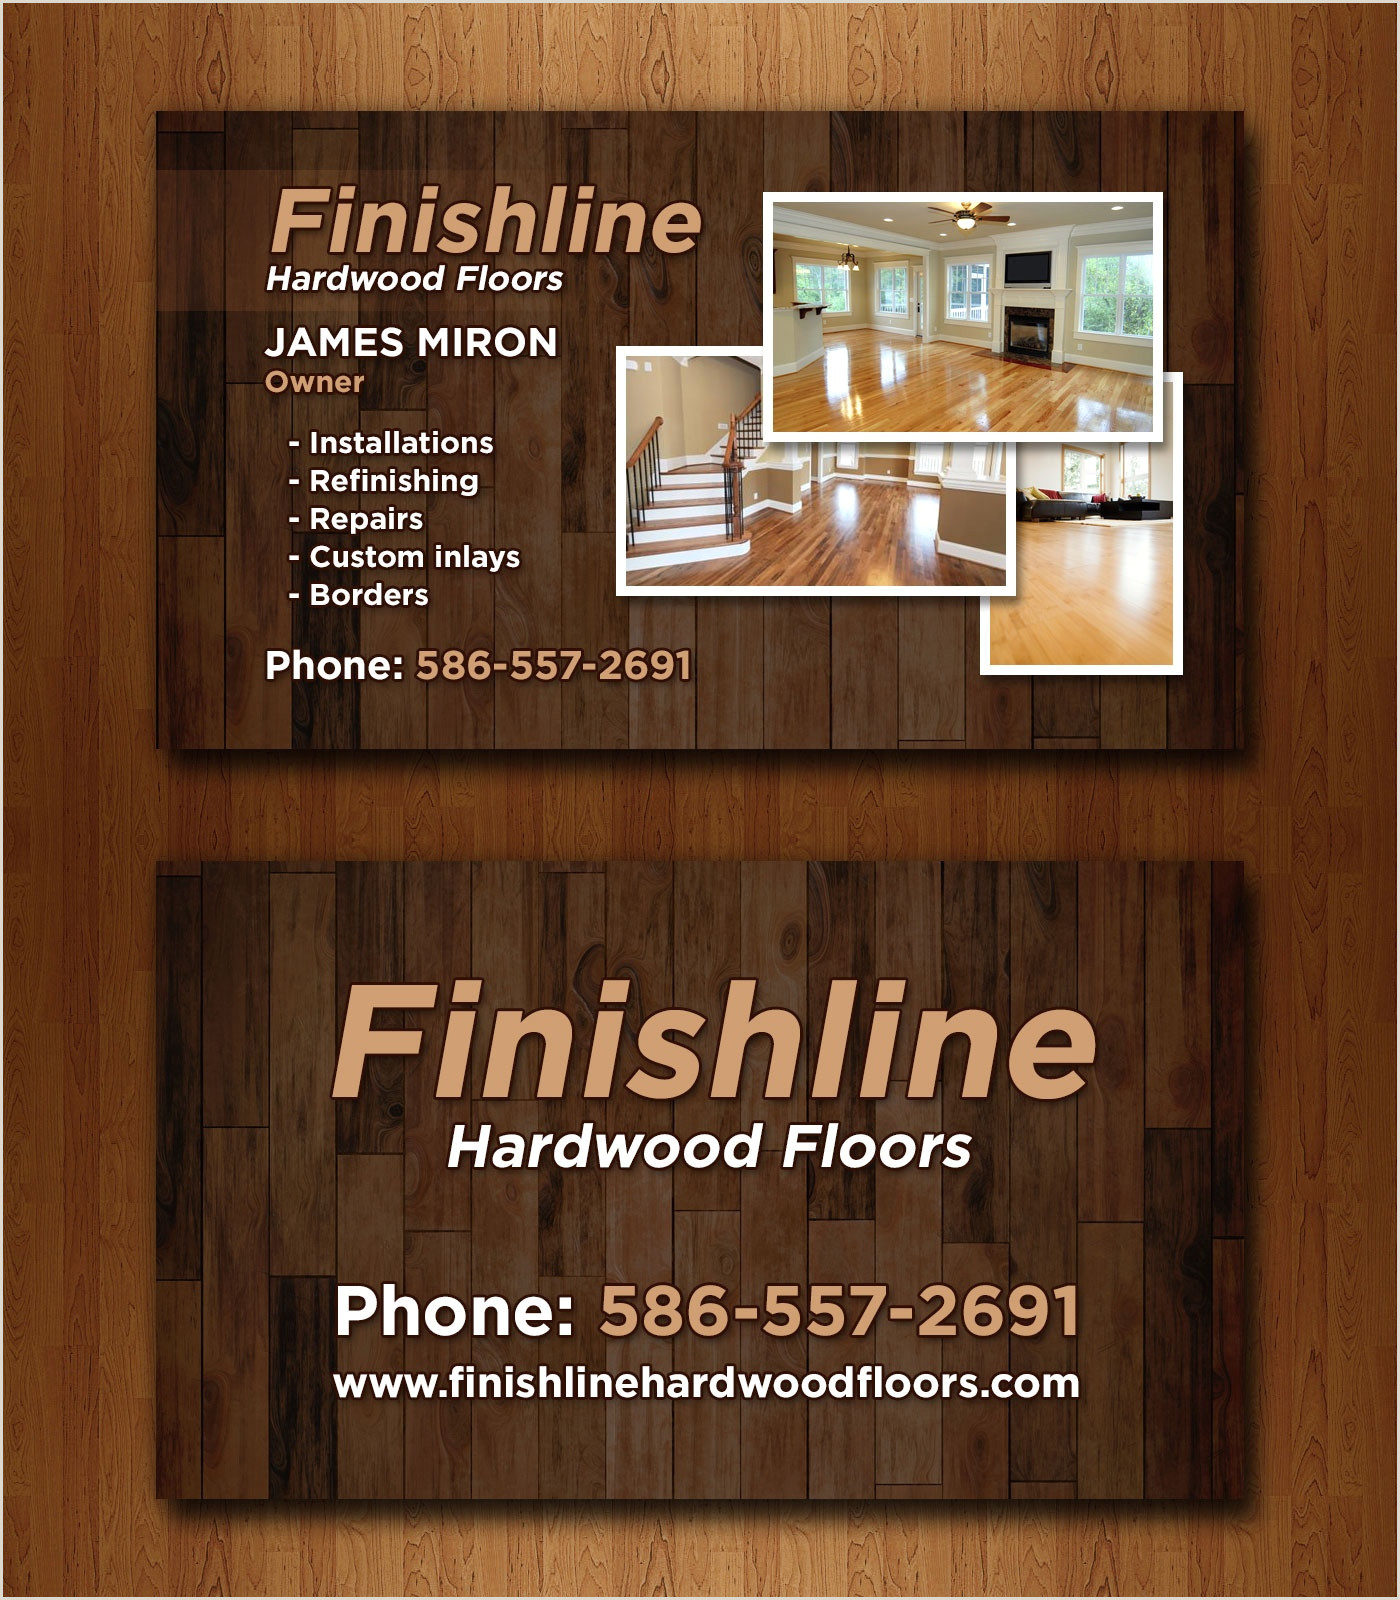 Simple Business Cards Templates 14 Popular Hardwood Flooring Business Card Template